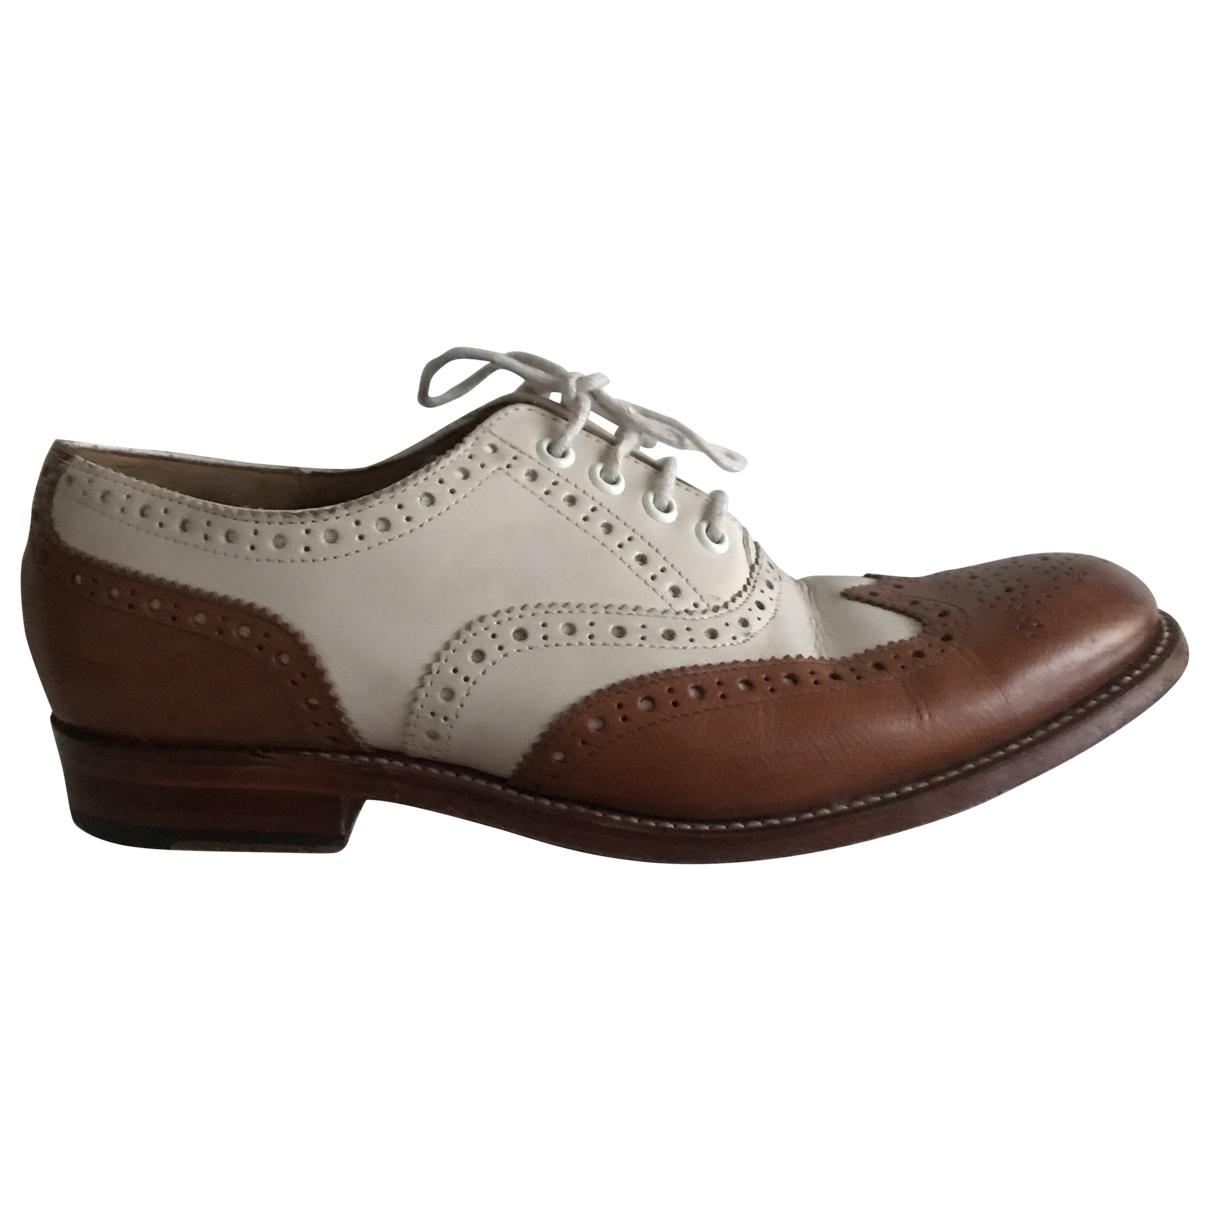 Grenson \N White Leather Flats for Women 5 UK